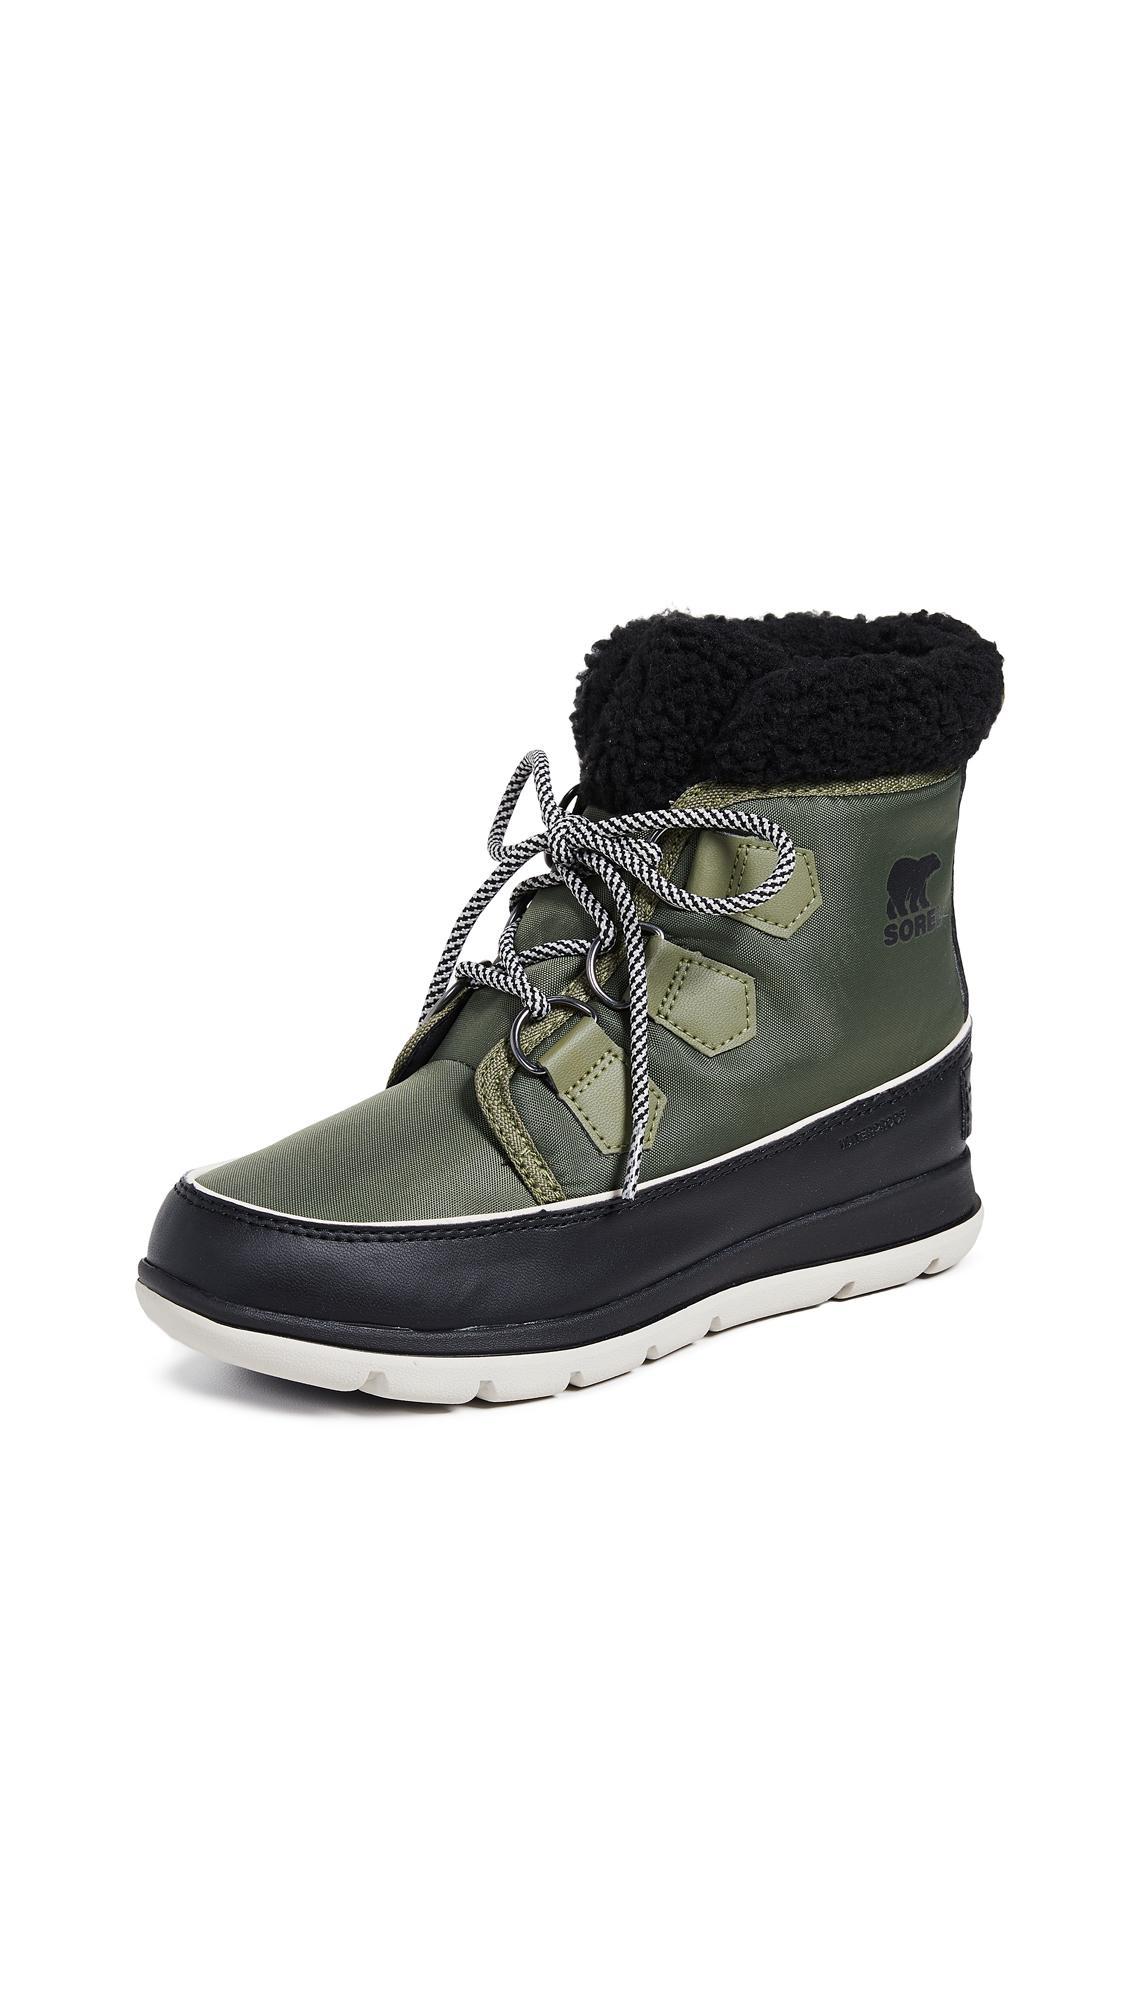 09f4ad9f1 Sorel Explorer Carnival Waterproof Boot With Faux Fur Collar In Hiker  Green/Black